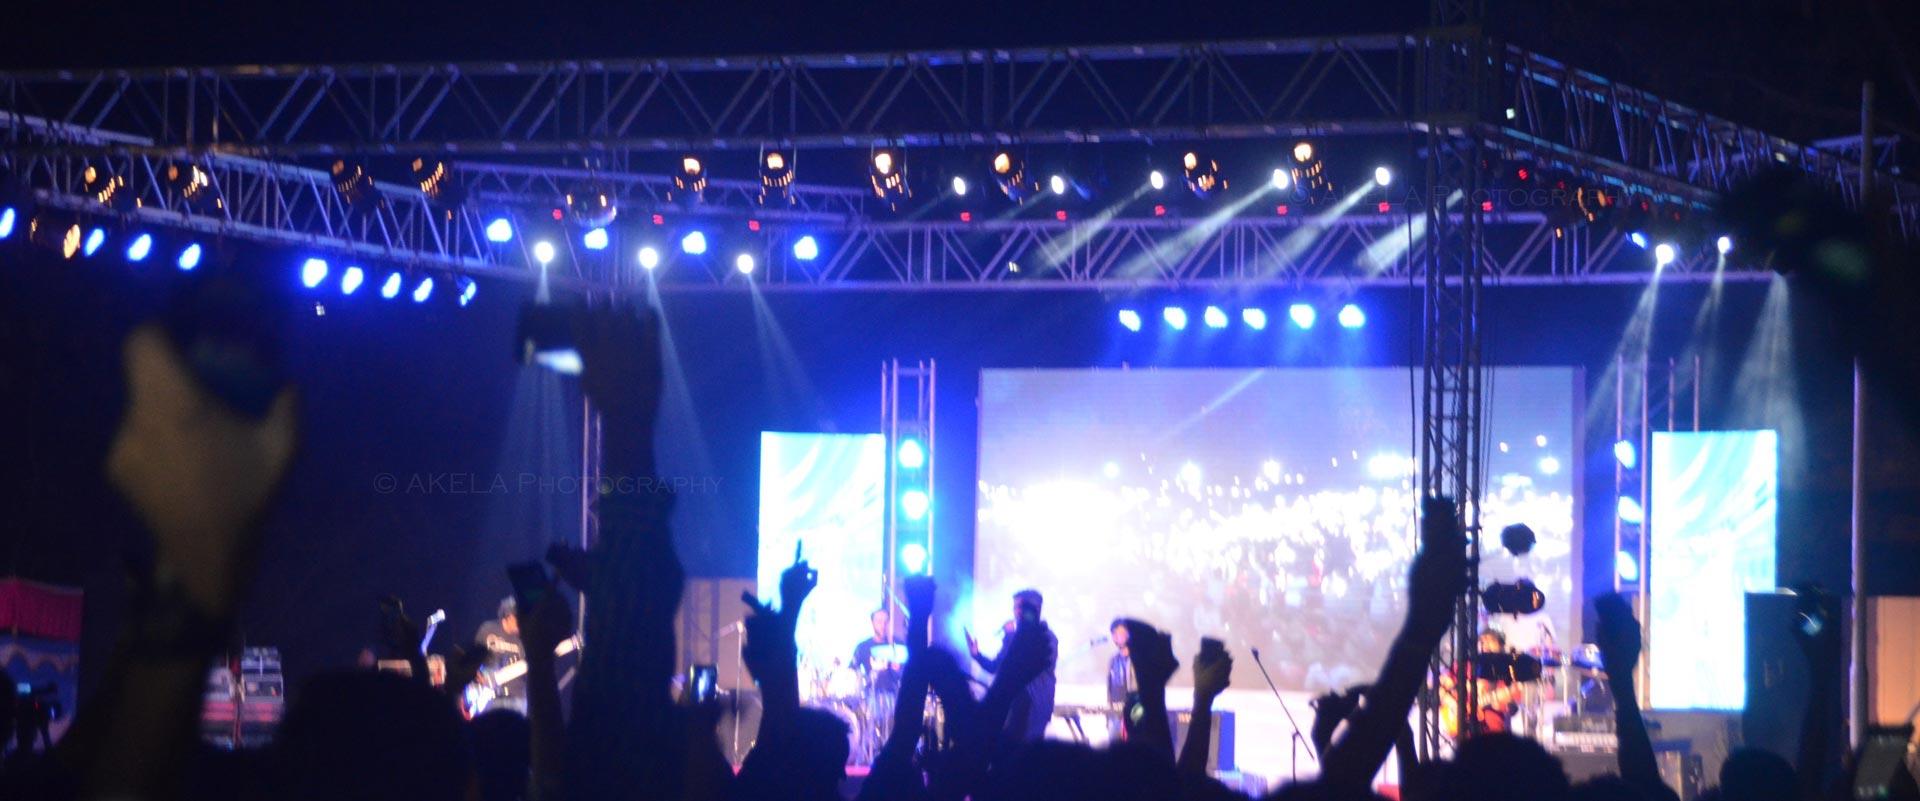 Concert Organizer Company